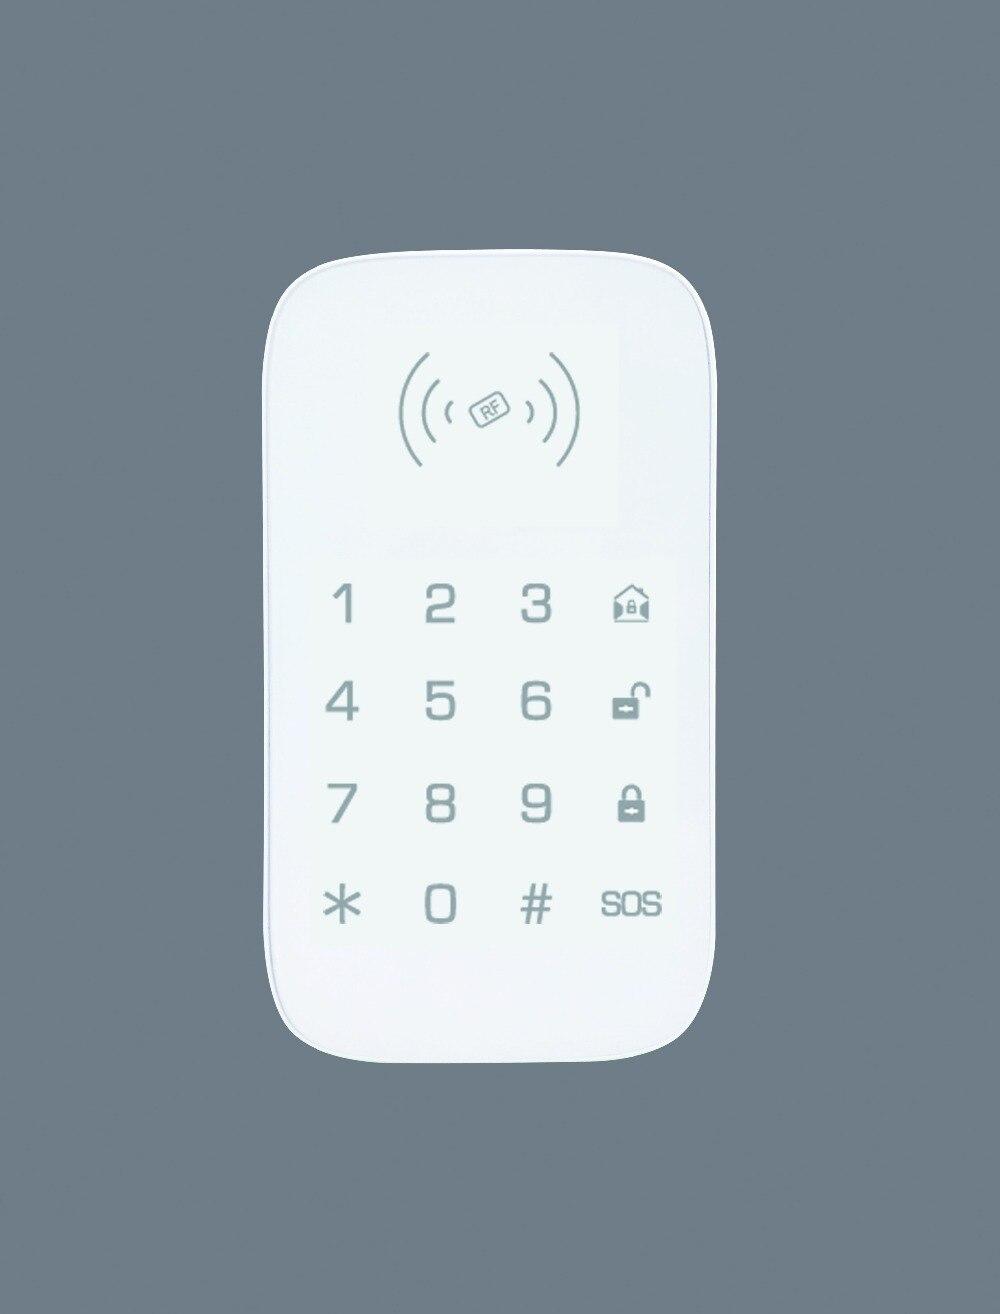 tela sensivel ao toque teclado rfid teclado 01